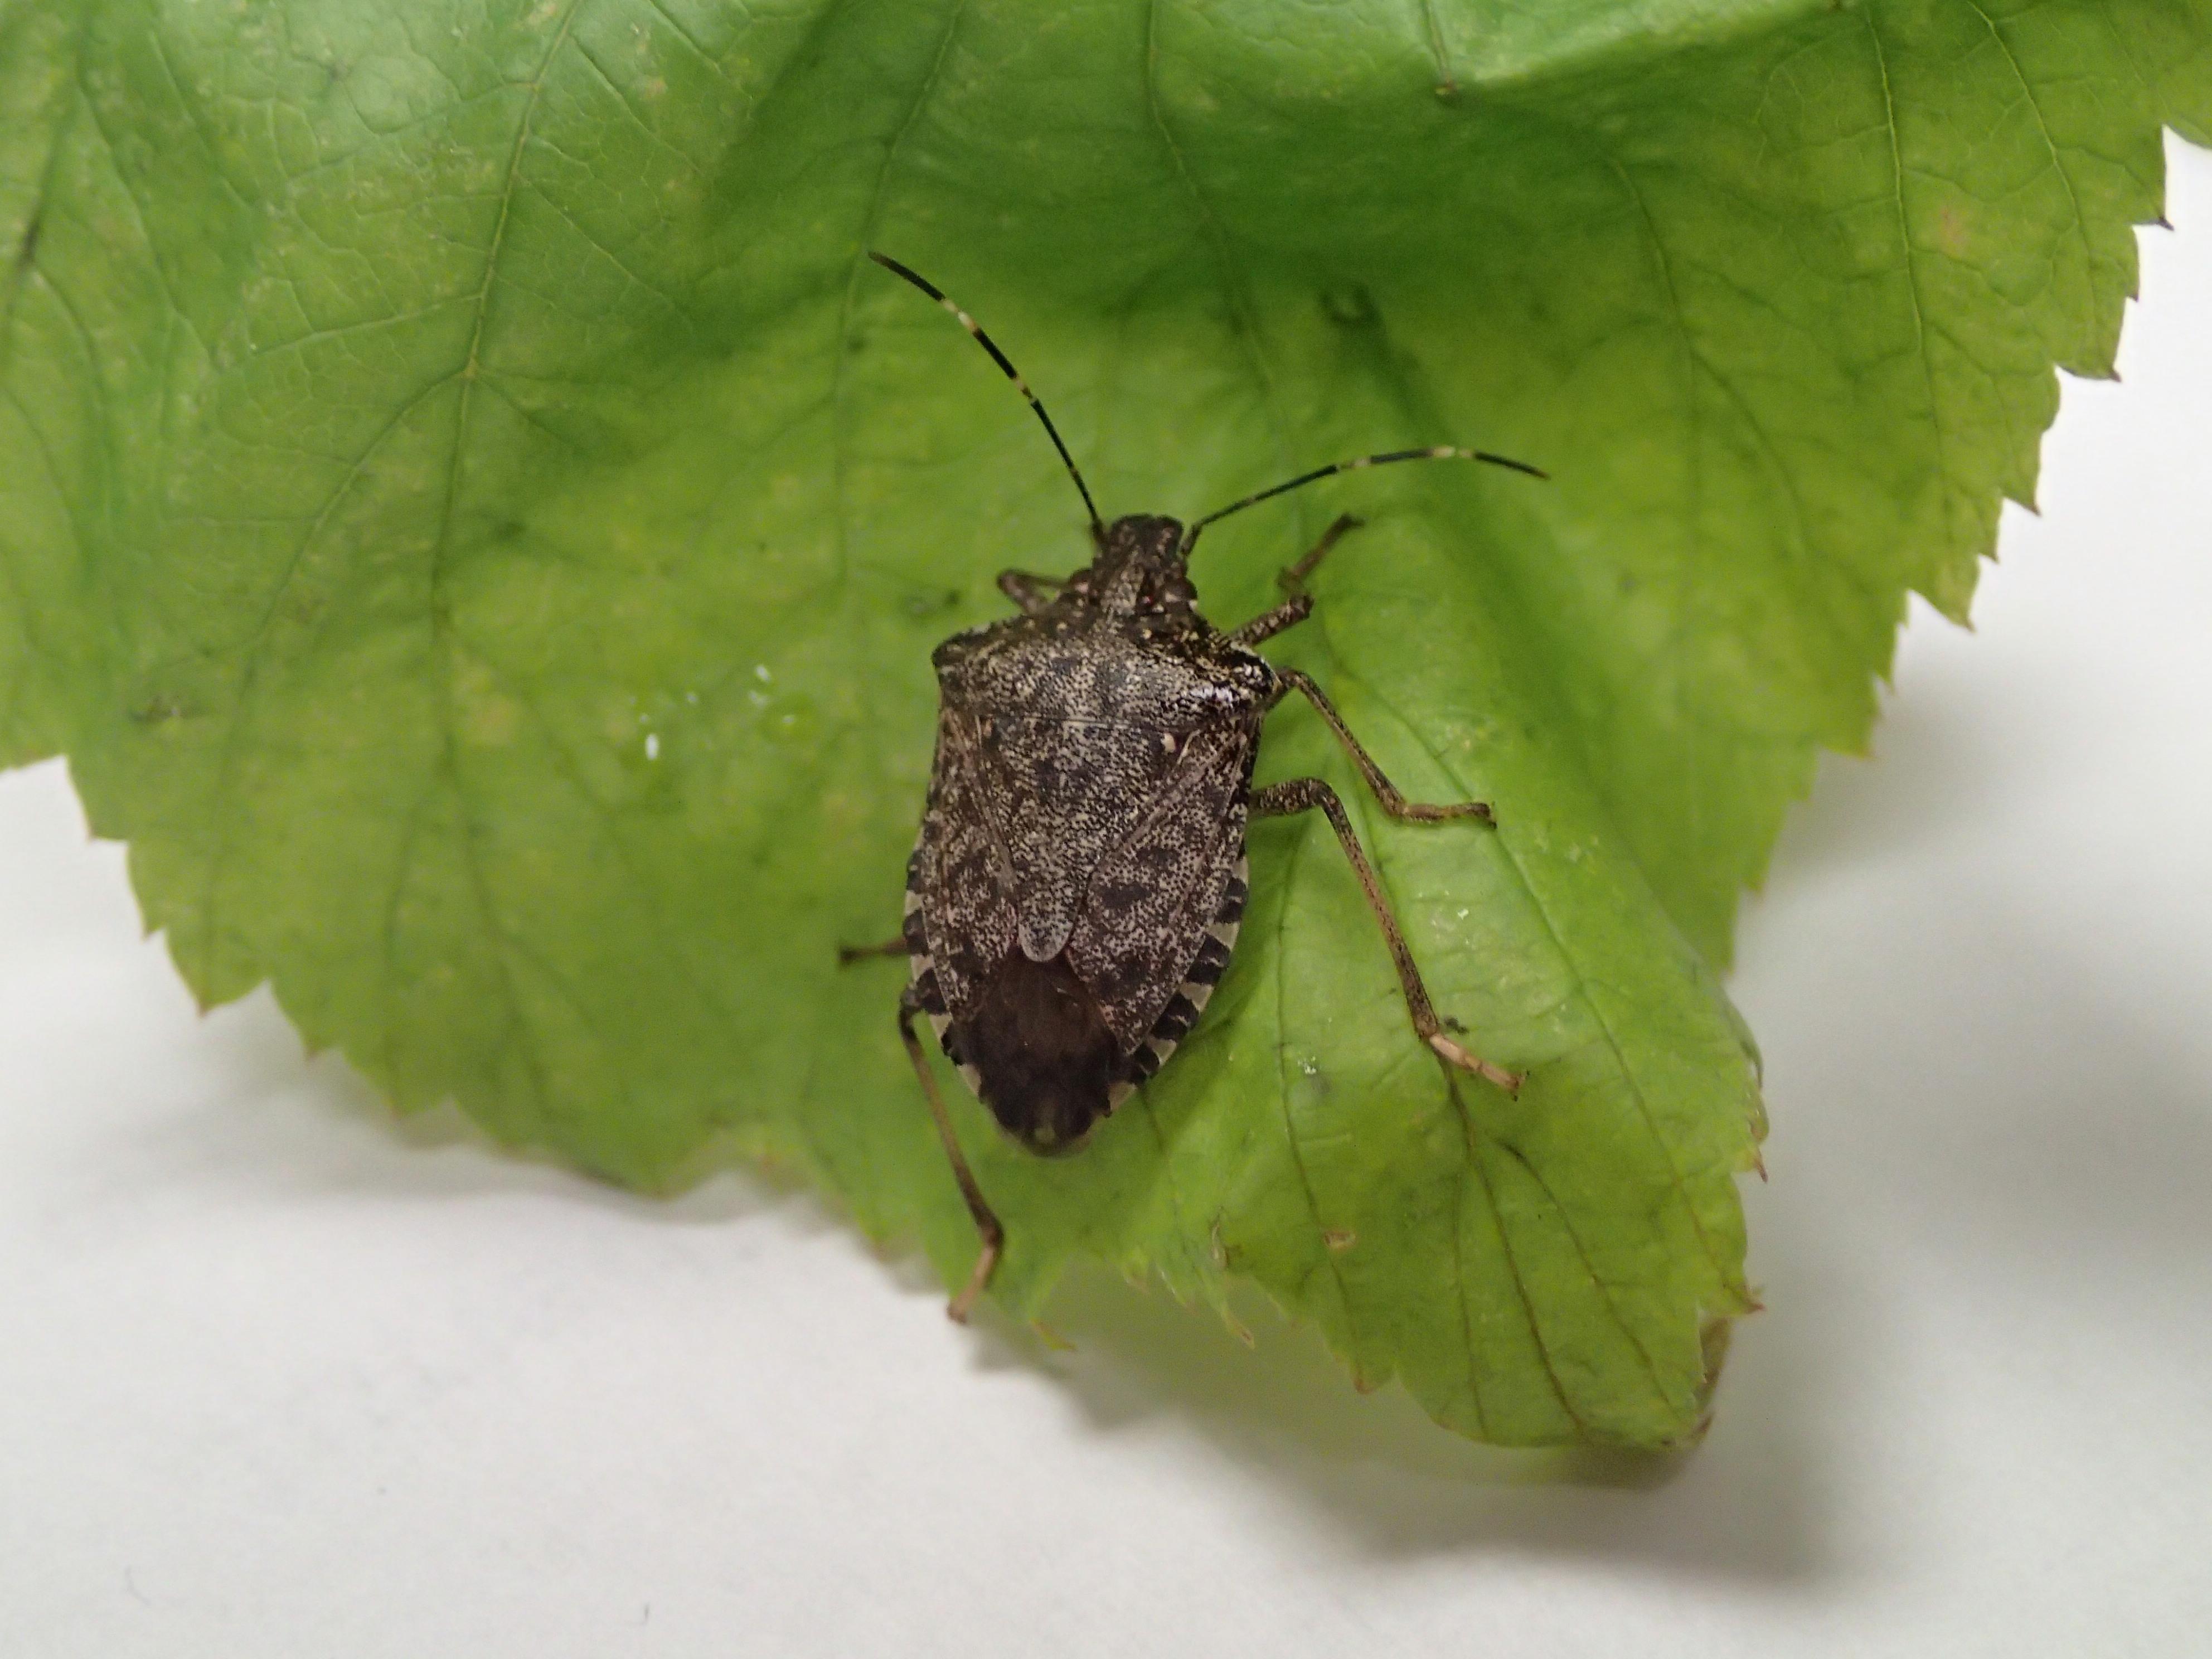 Apple-Stink bug | Pacific Northwest Pest Management Handbooks